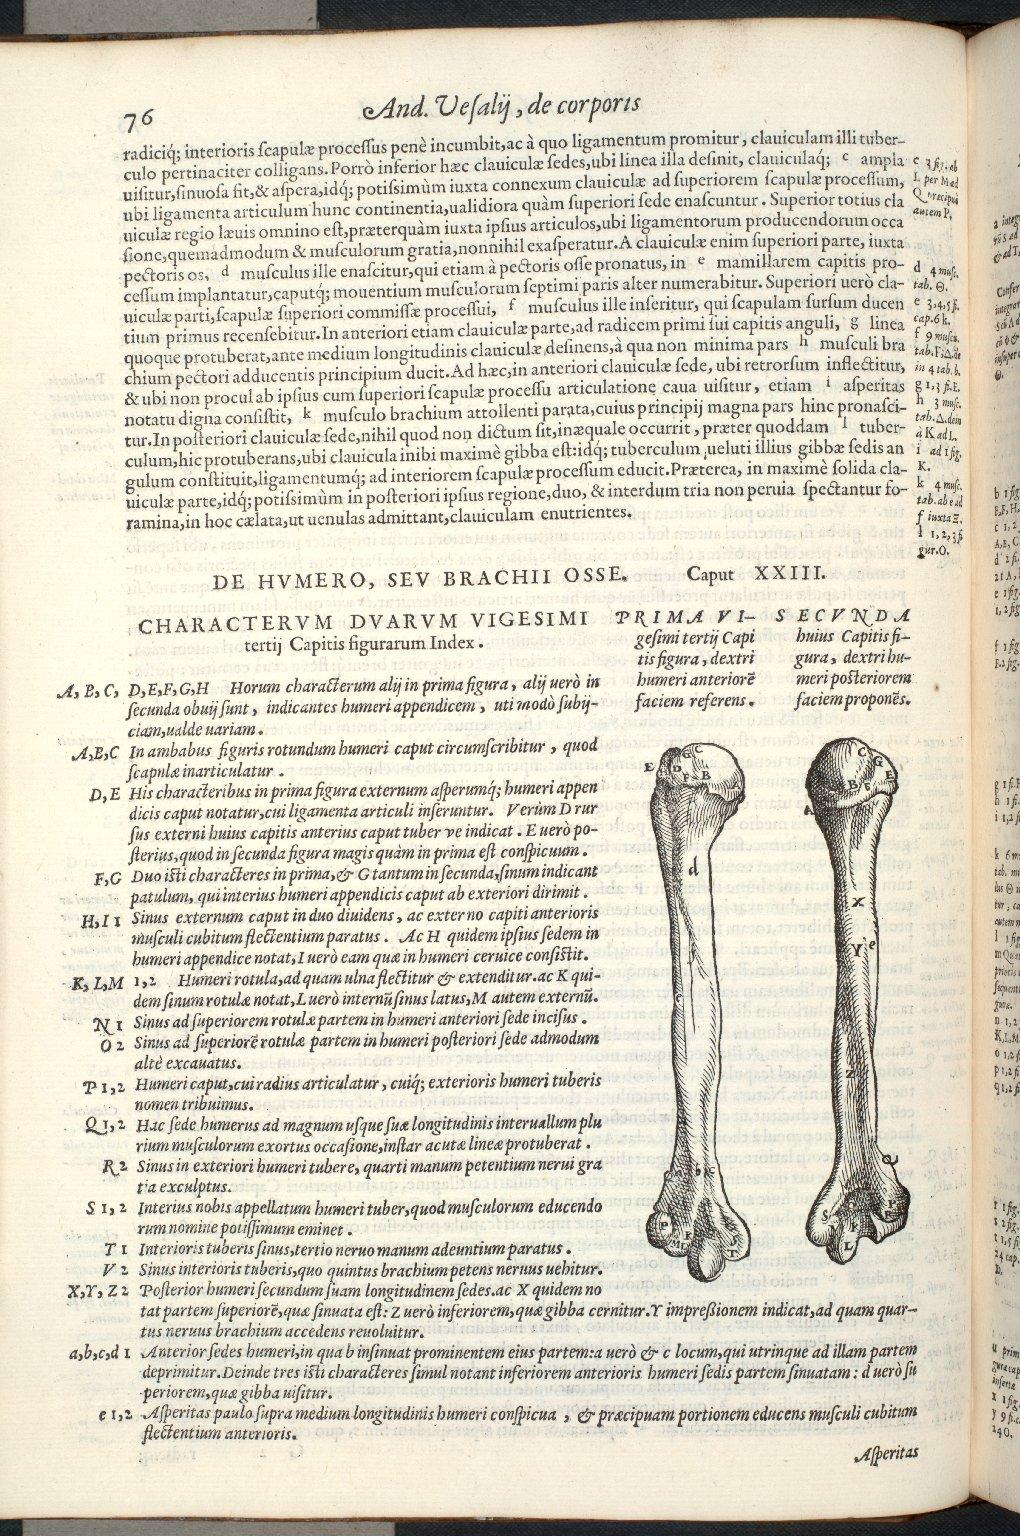 De humero sev brachii osse. Caput XXIII. Fig.I-II